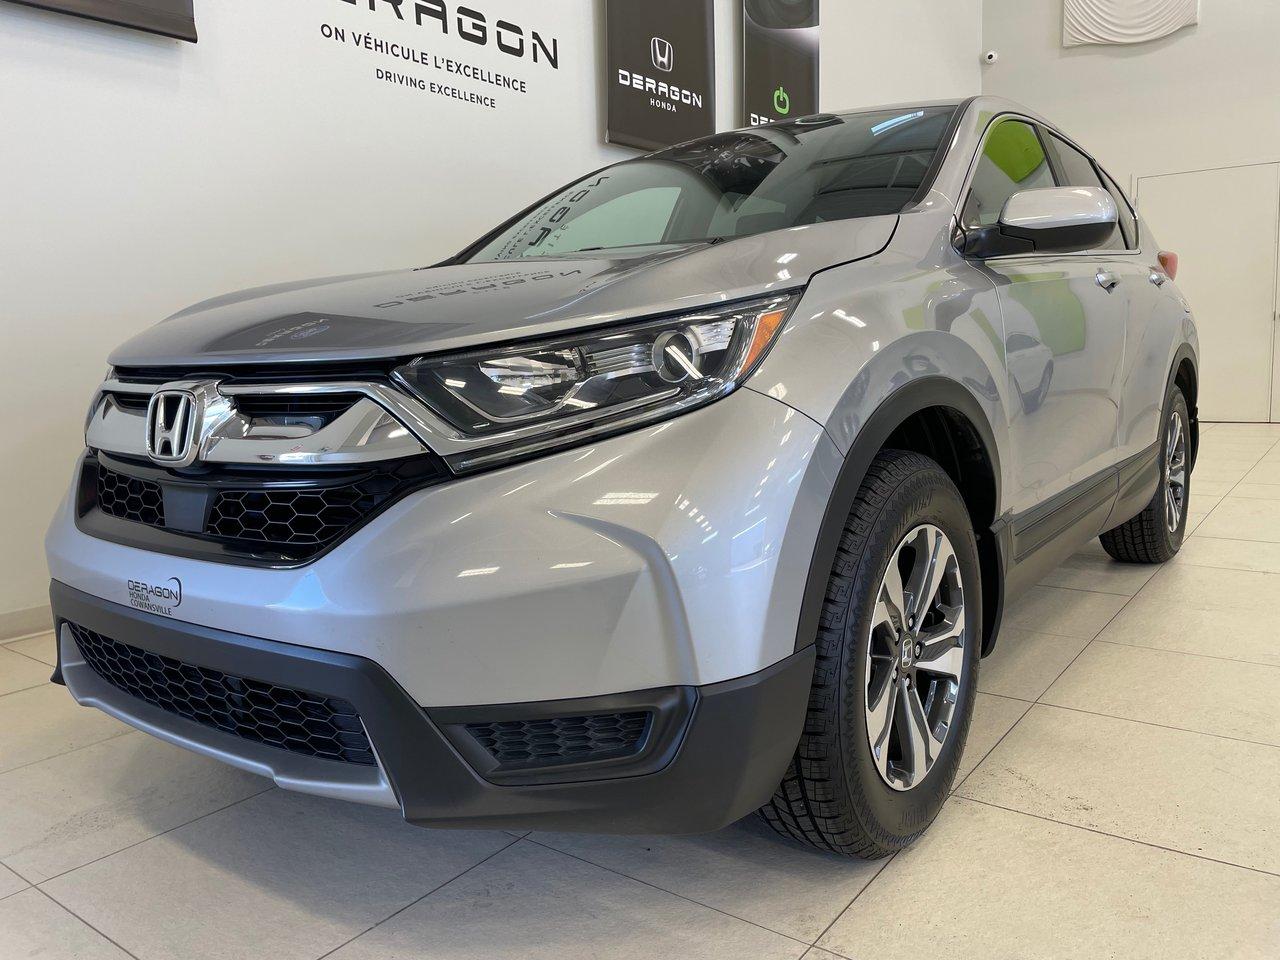 Honda CR-V 2018 LX 1.5L AWD, HITCH, HONDA SENSING, DEMARREUR